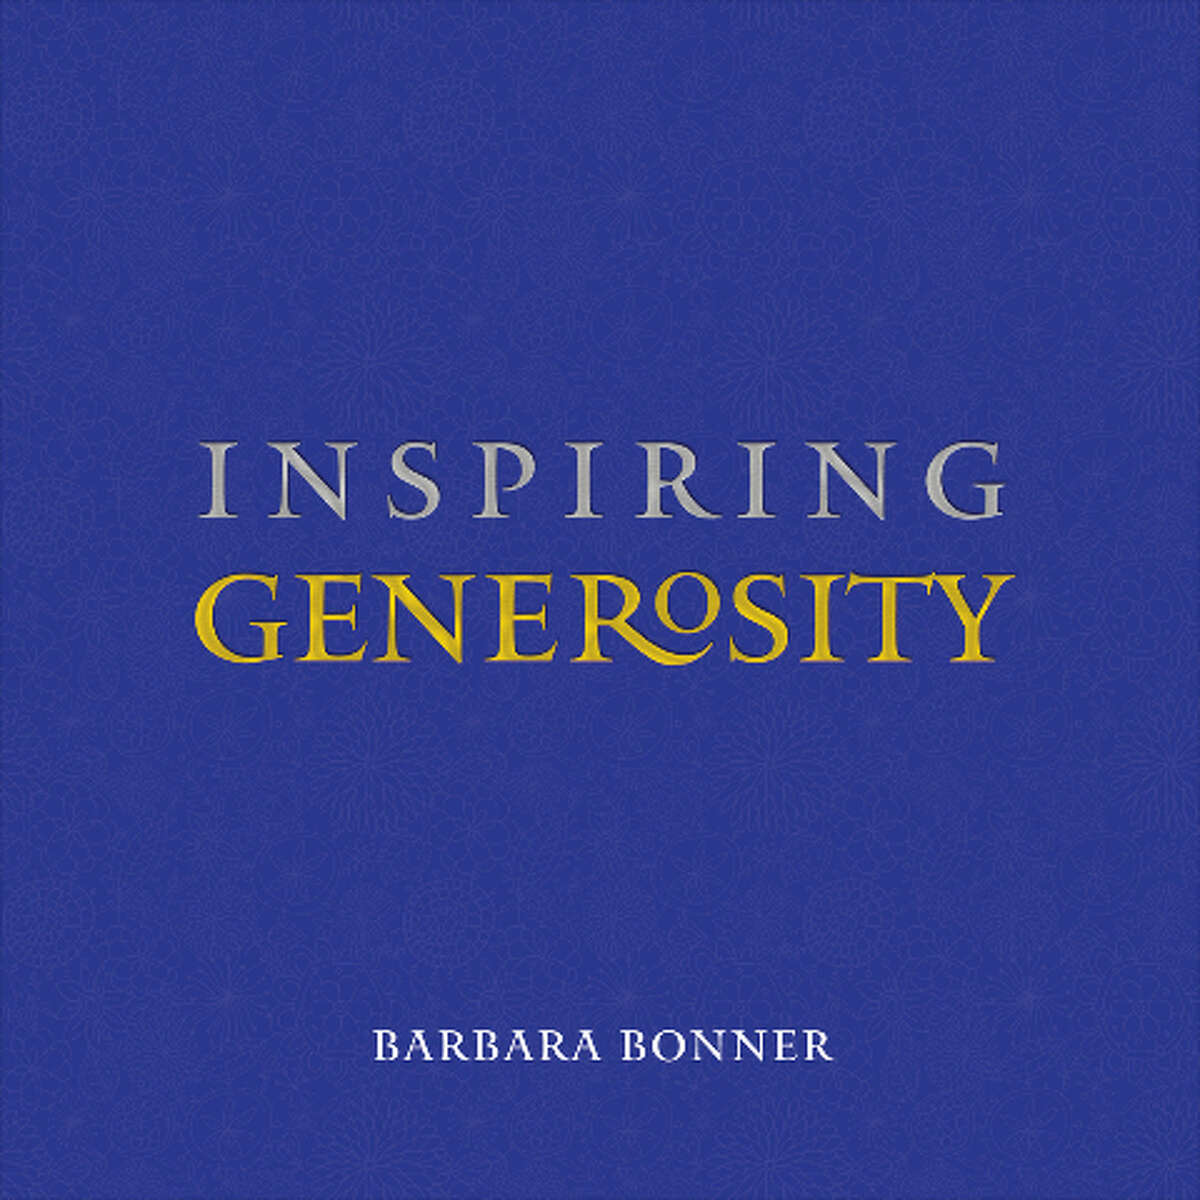 Barbara Bonner, author of